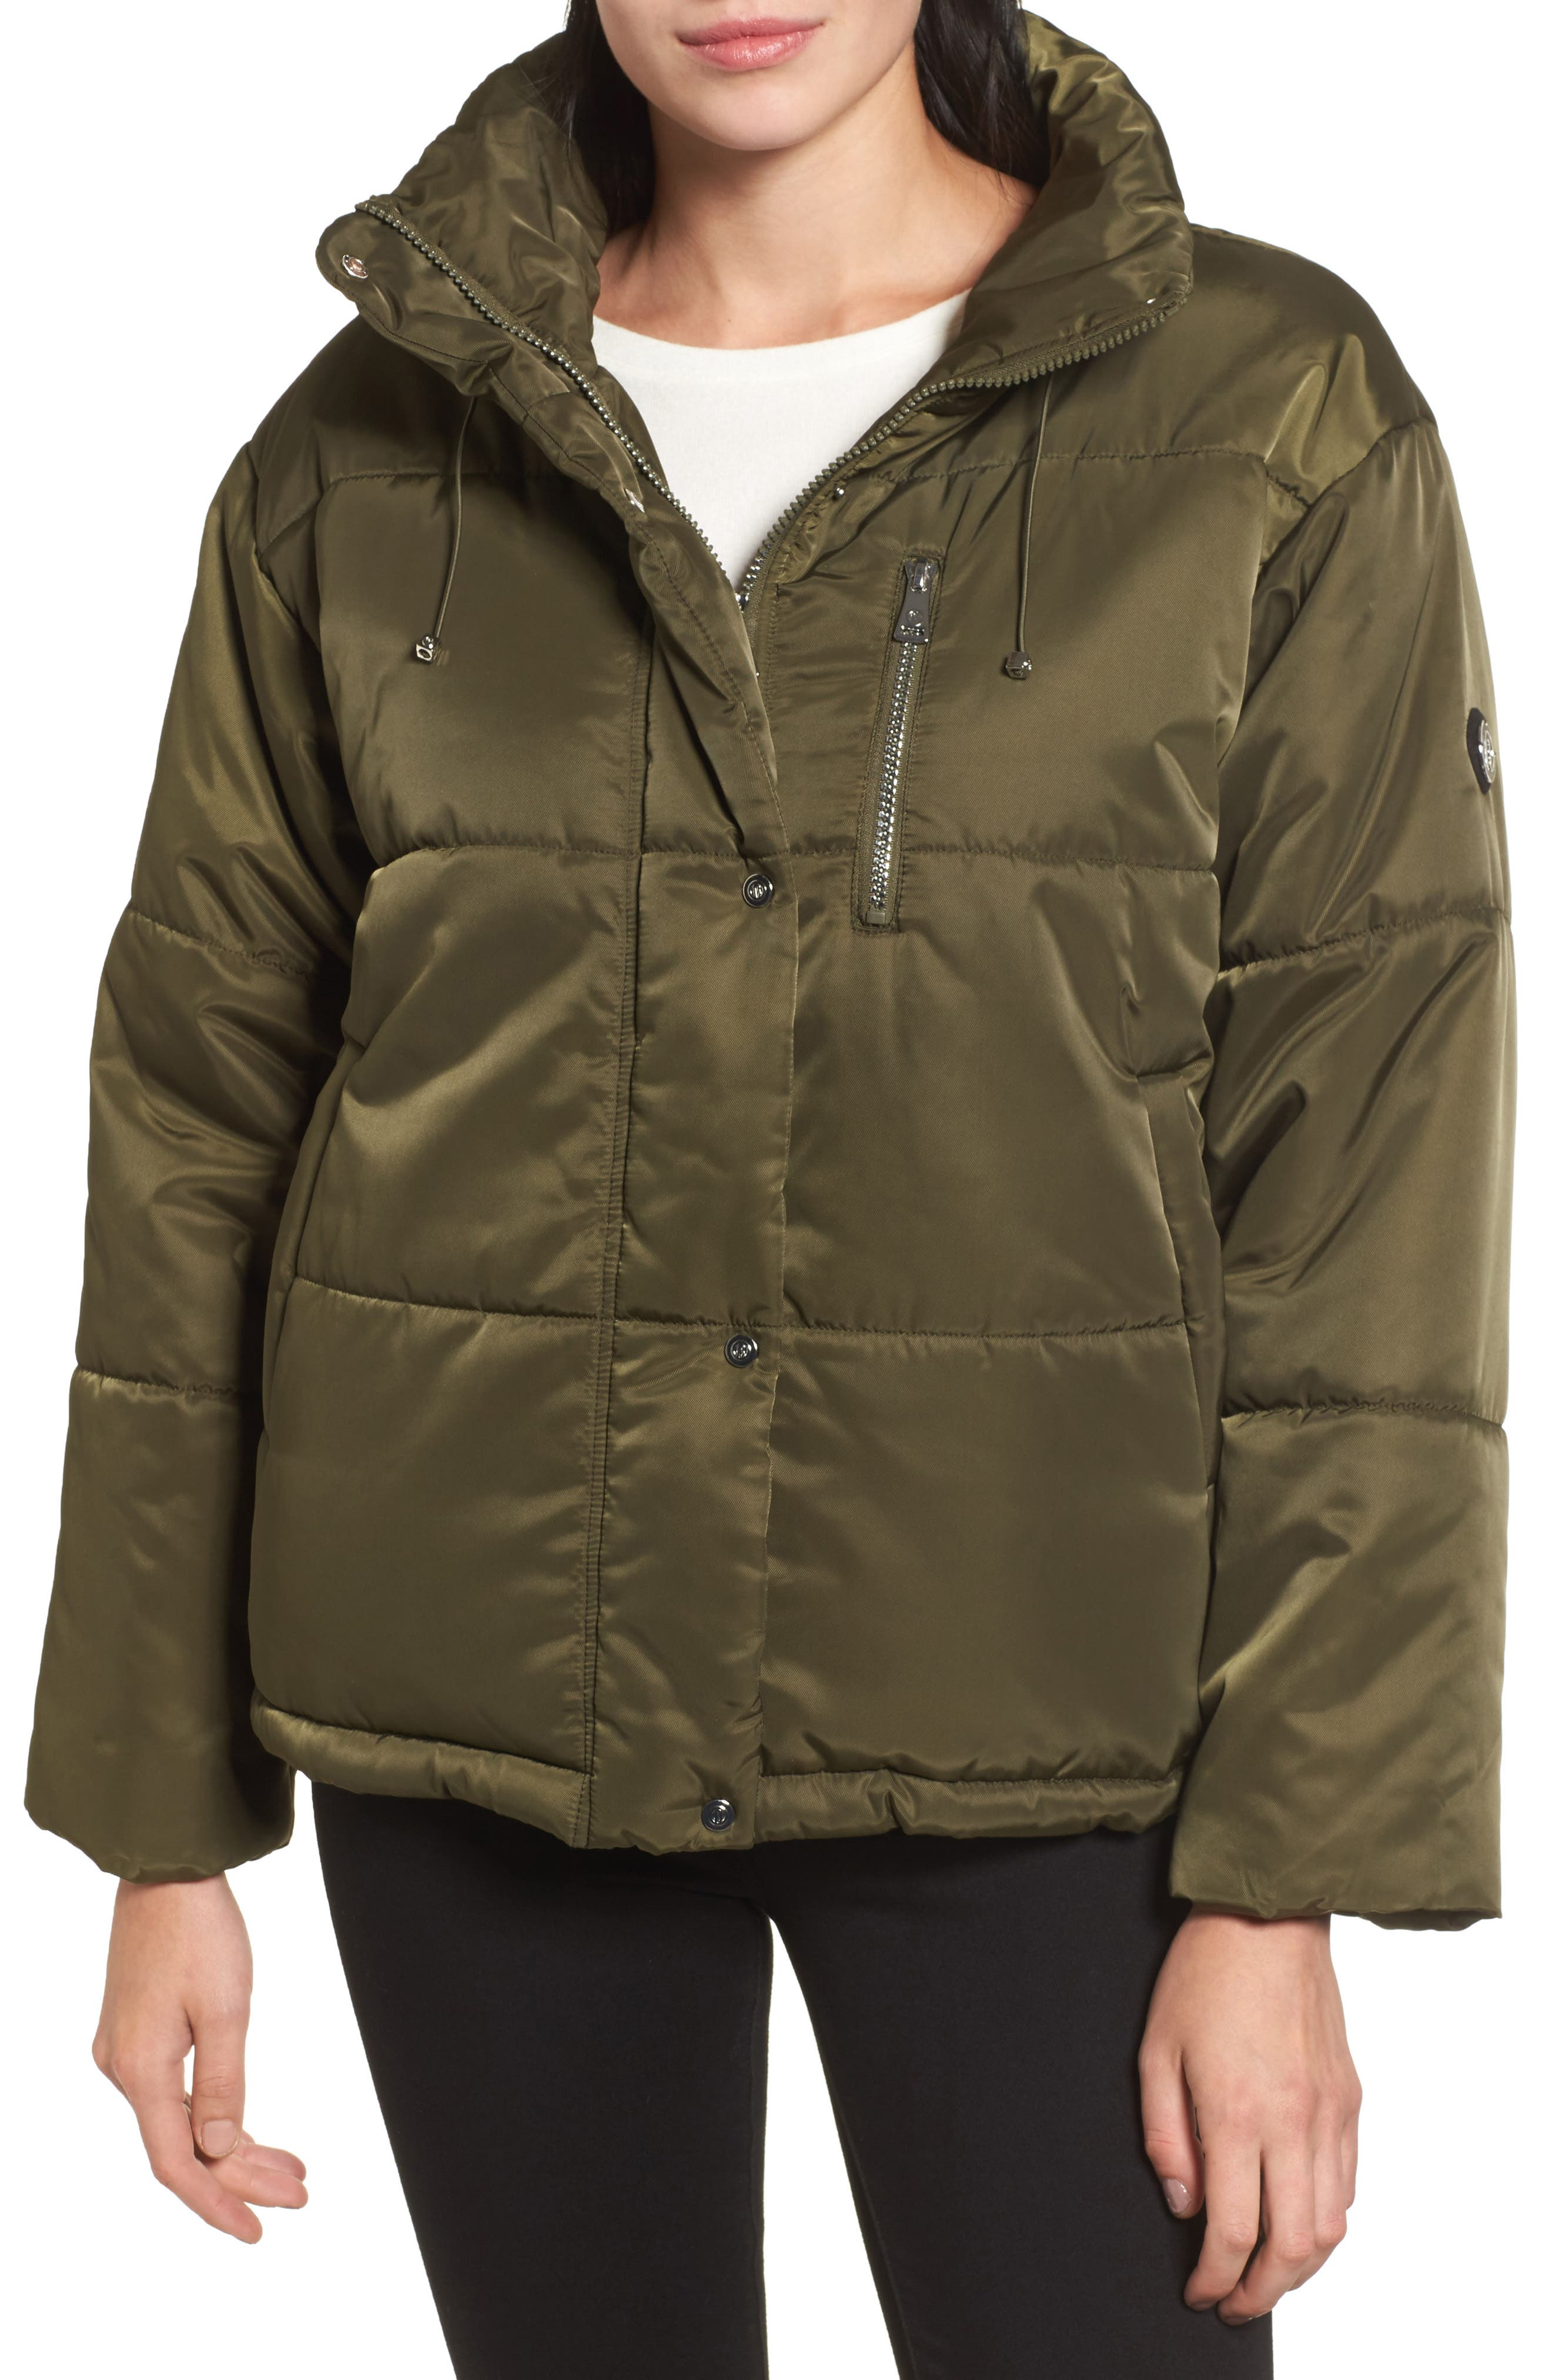 Alternate Image 1 Selected - Bernardo Oversize Puffer Jacket